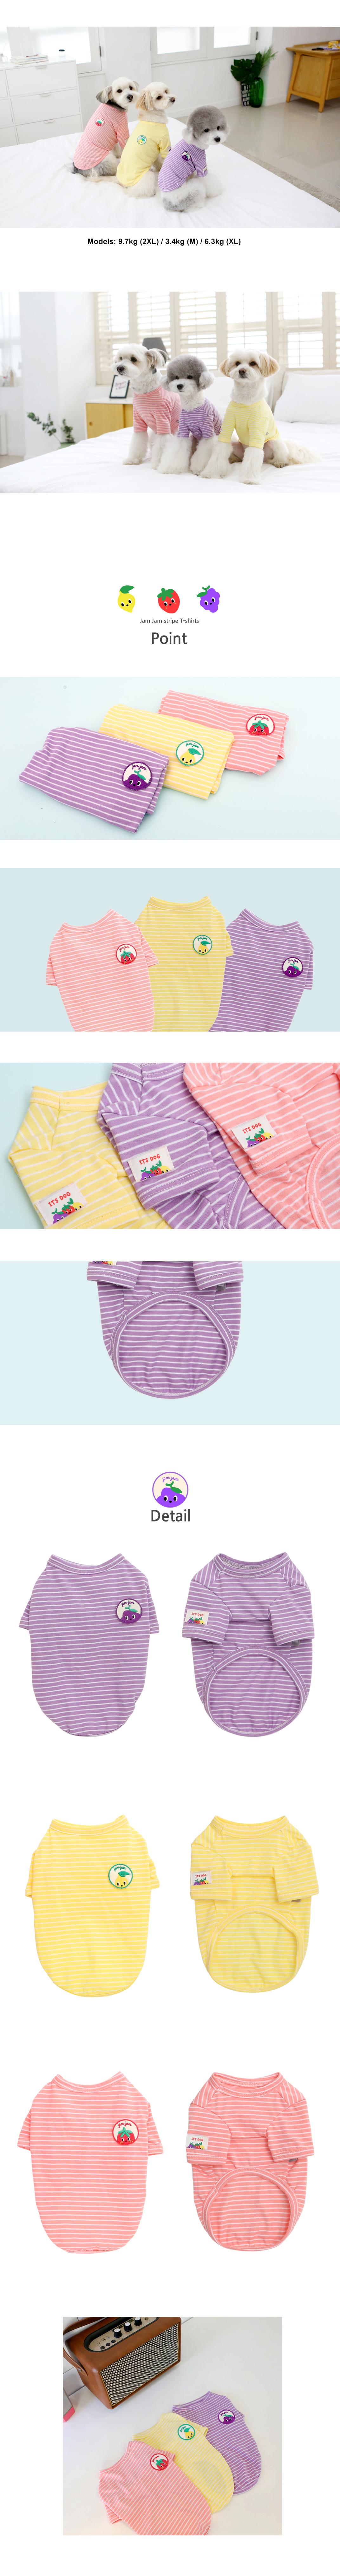 jamjam-stripe-t-shirts-01.jpg